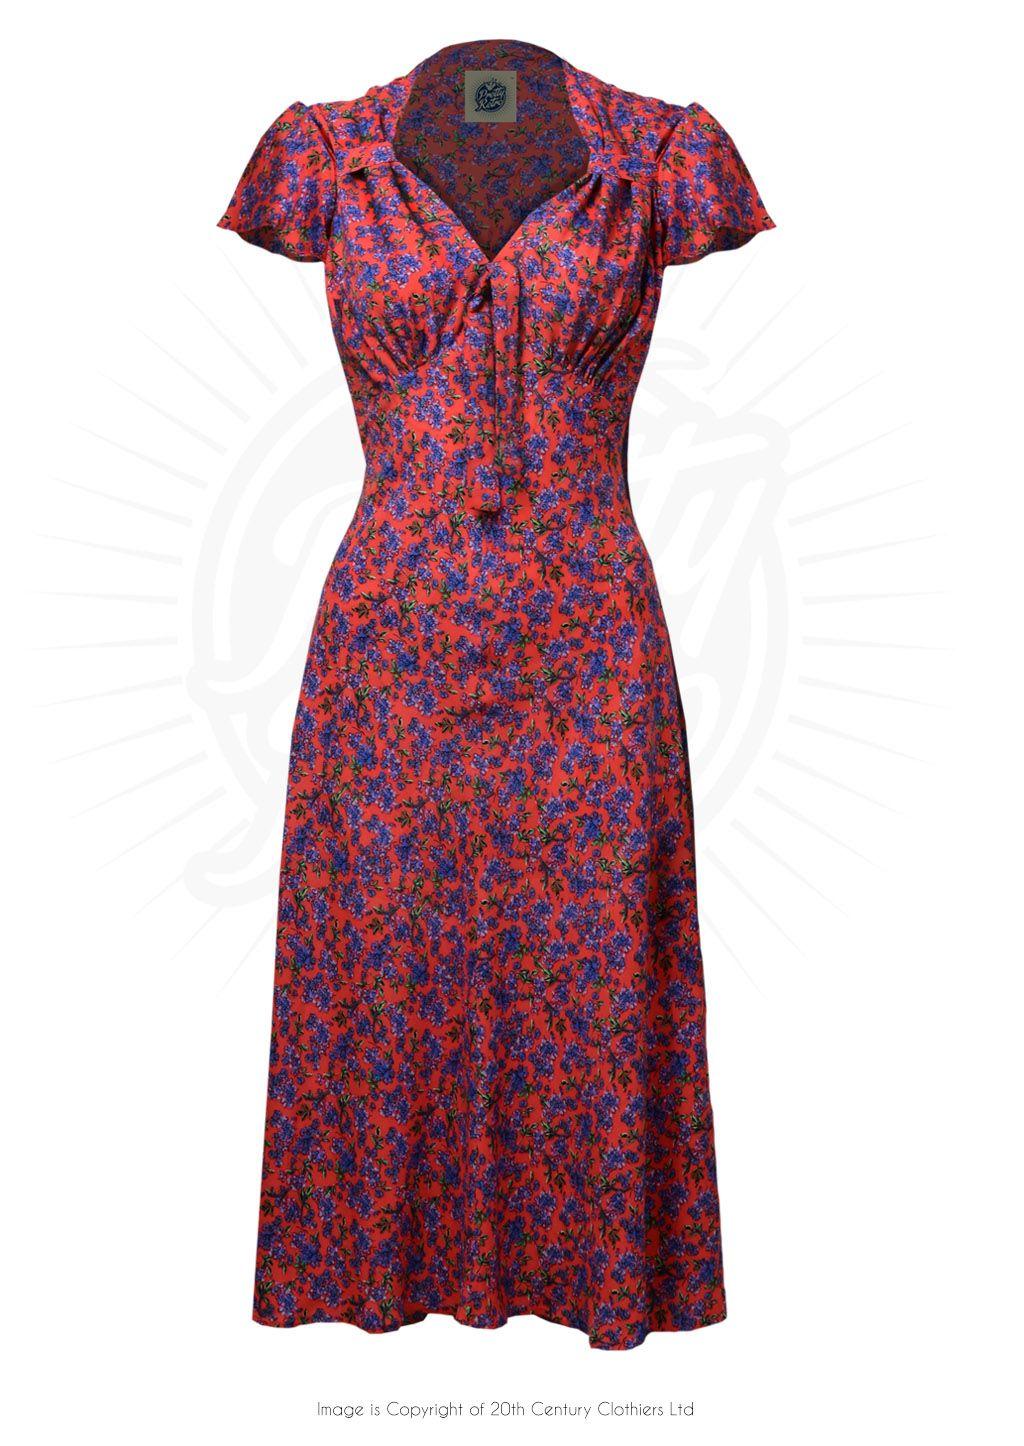 3b06edcfe473 Pretty 40s Style Tea Dress in Red Ditsy Print